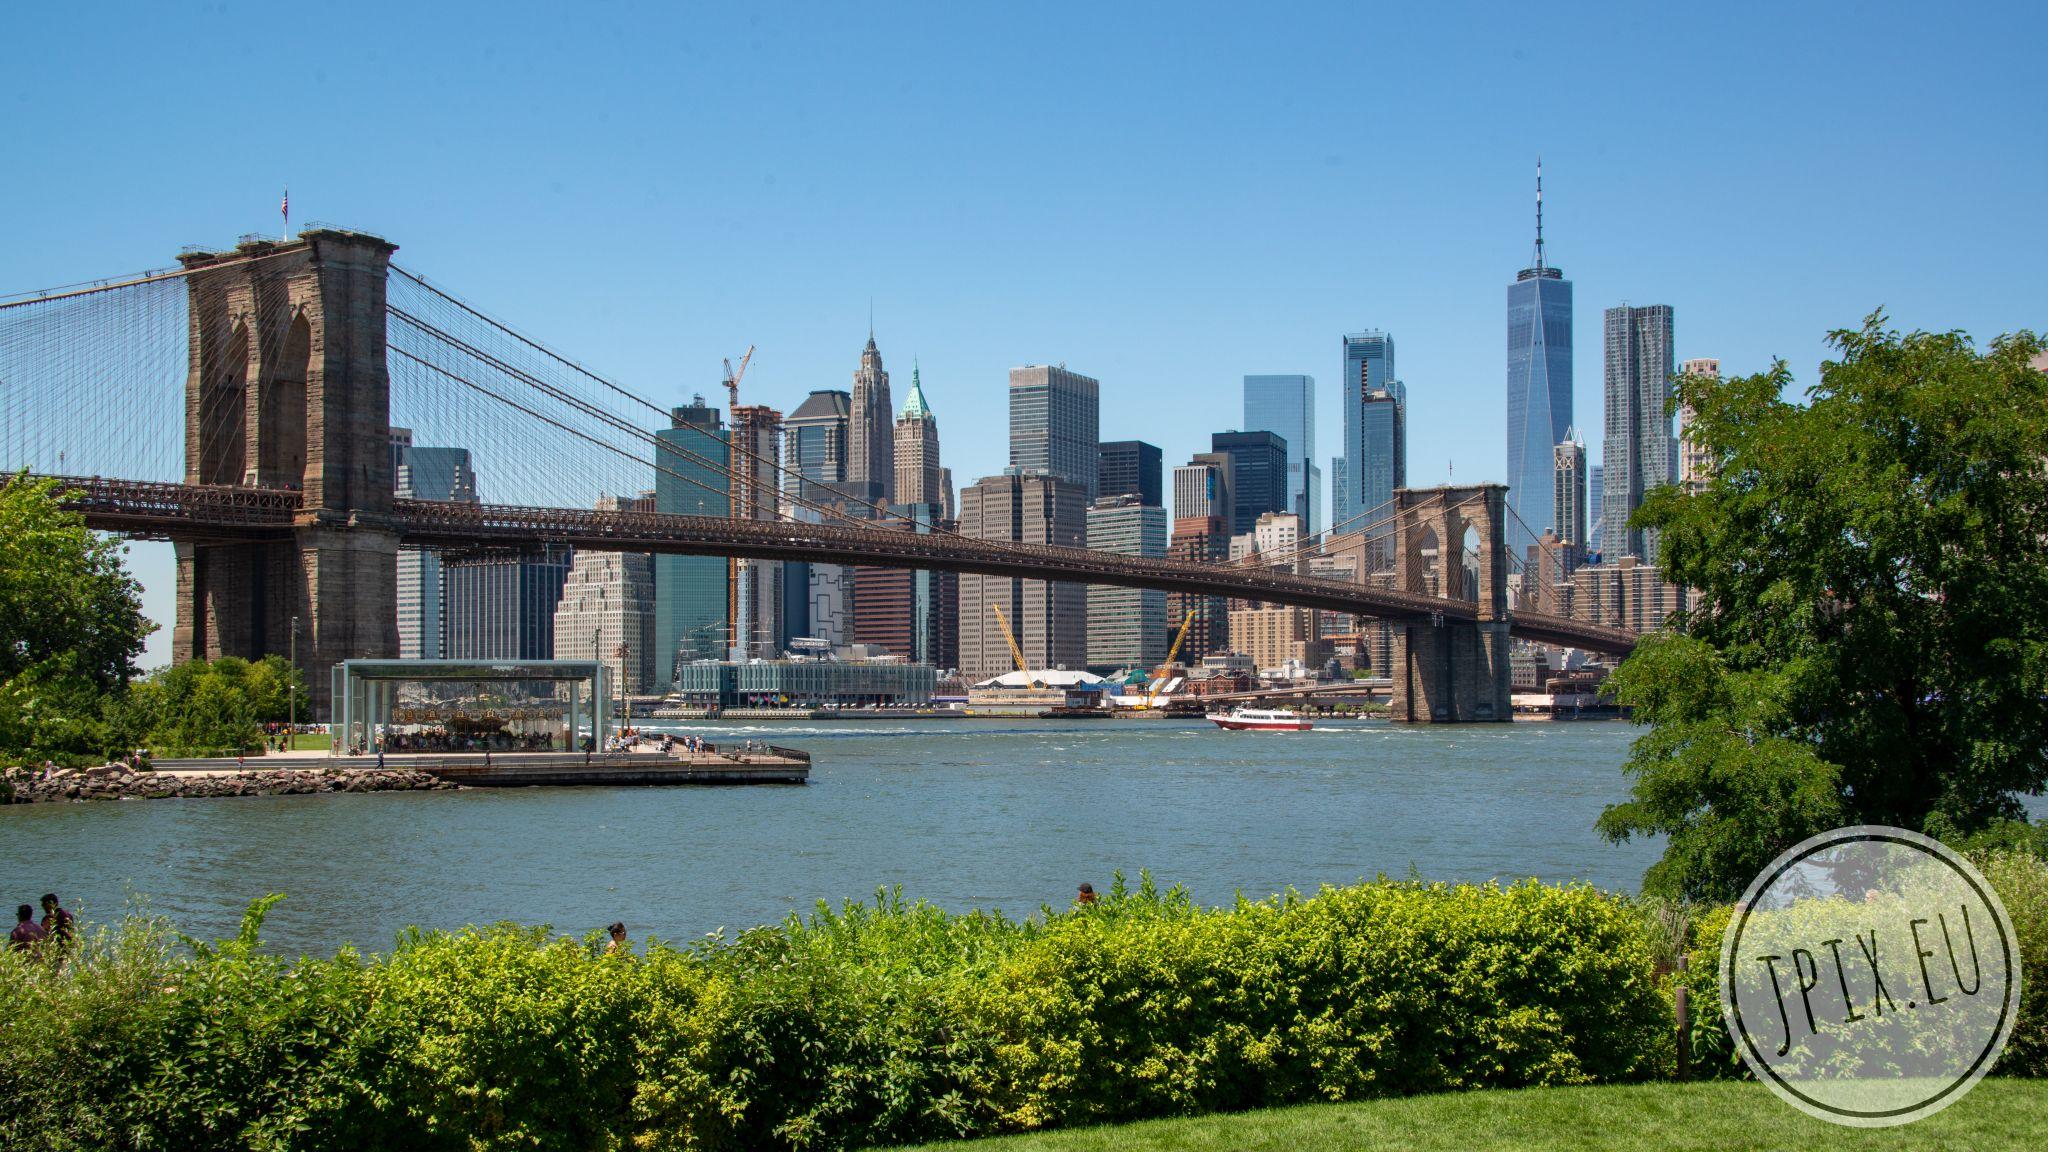 Brooklyn Bridge New York Skyline, USA